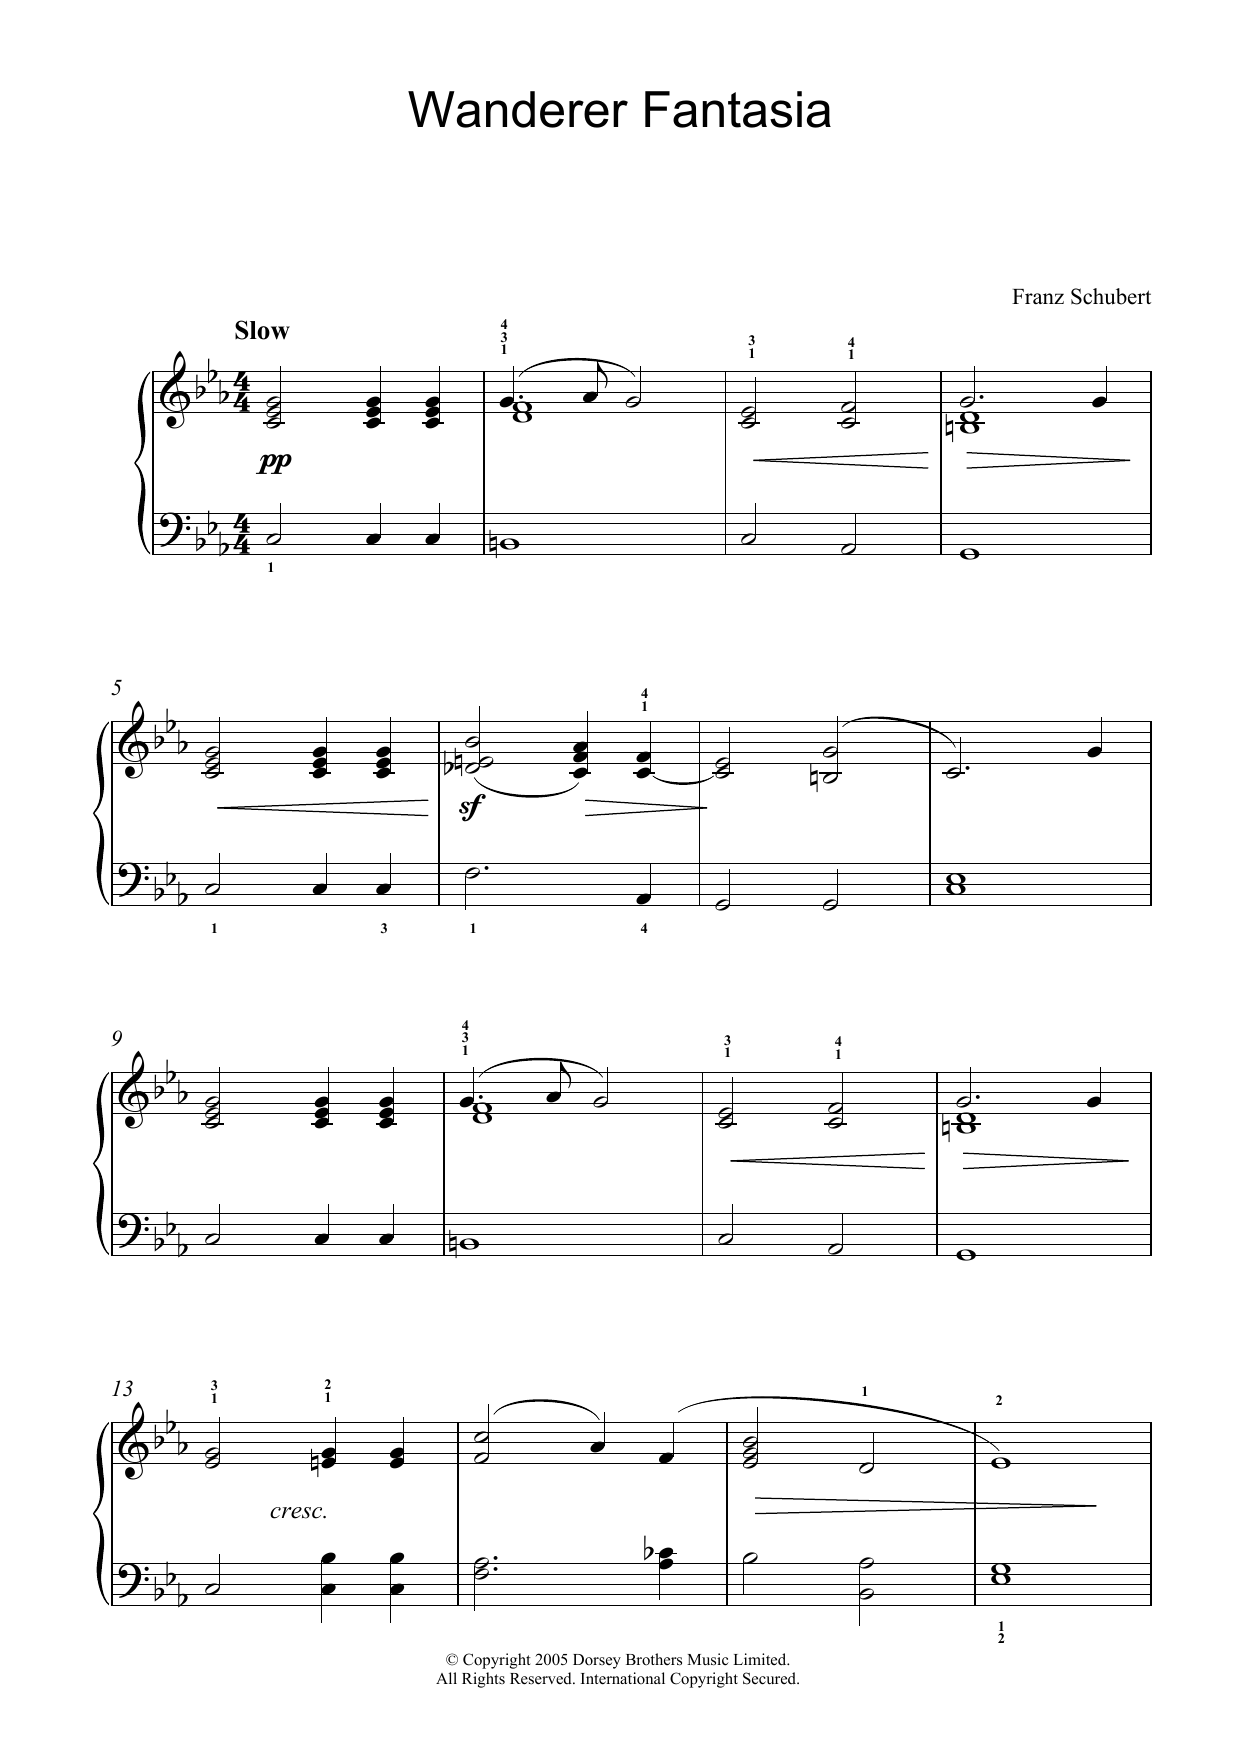 Wanderer Fantasia (Piano Solo)